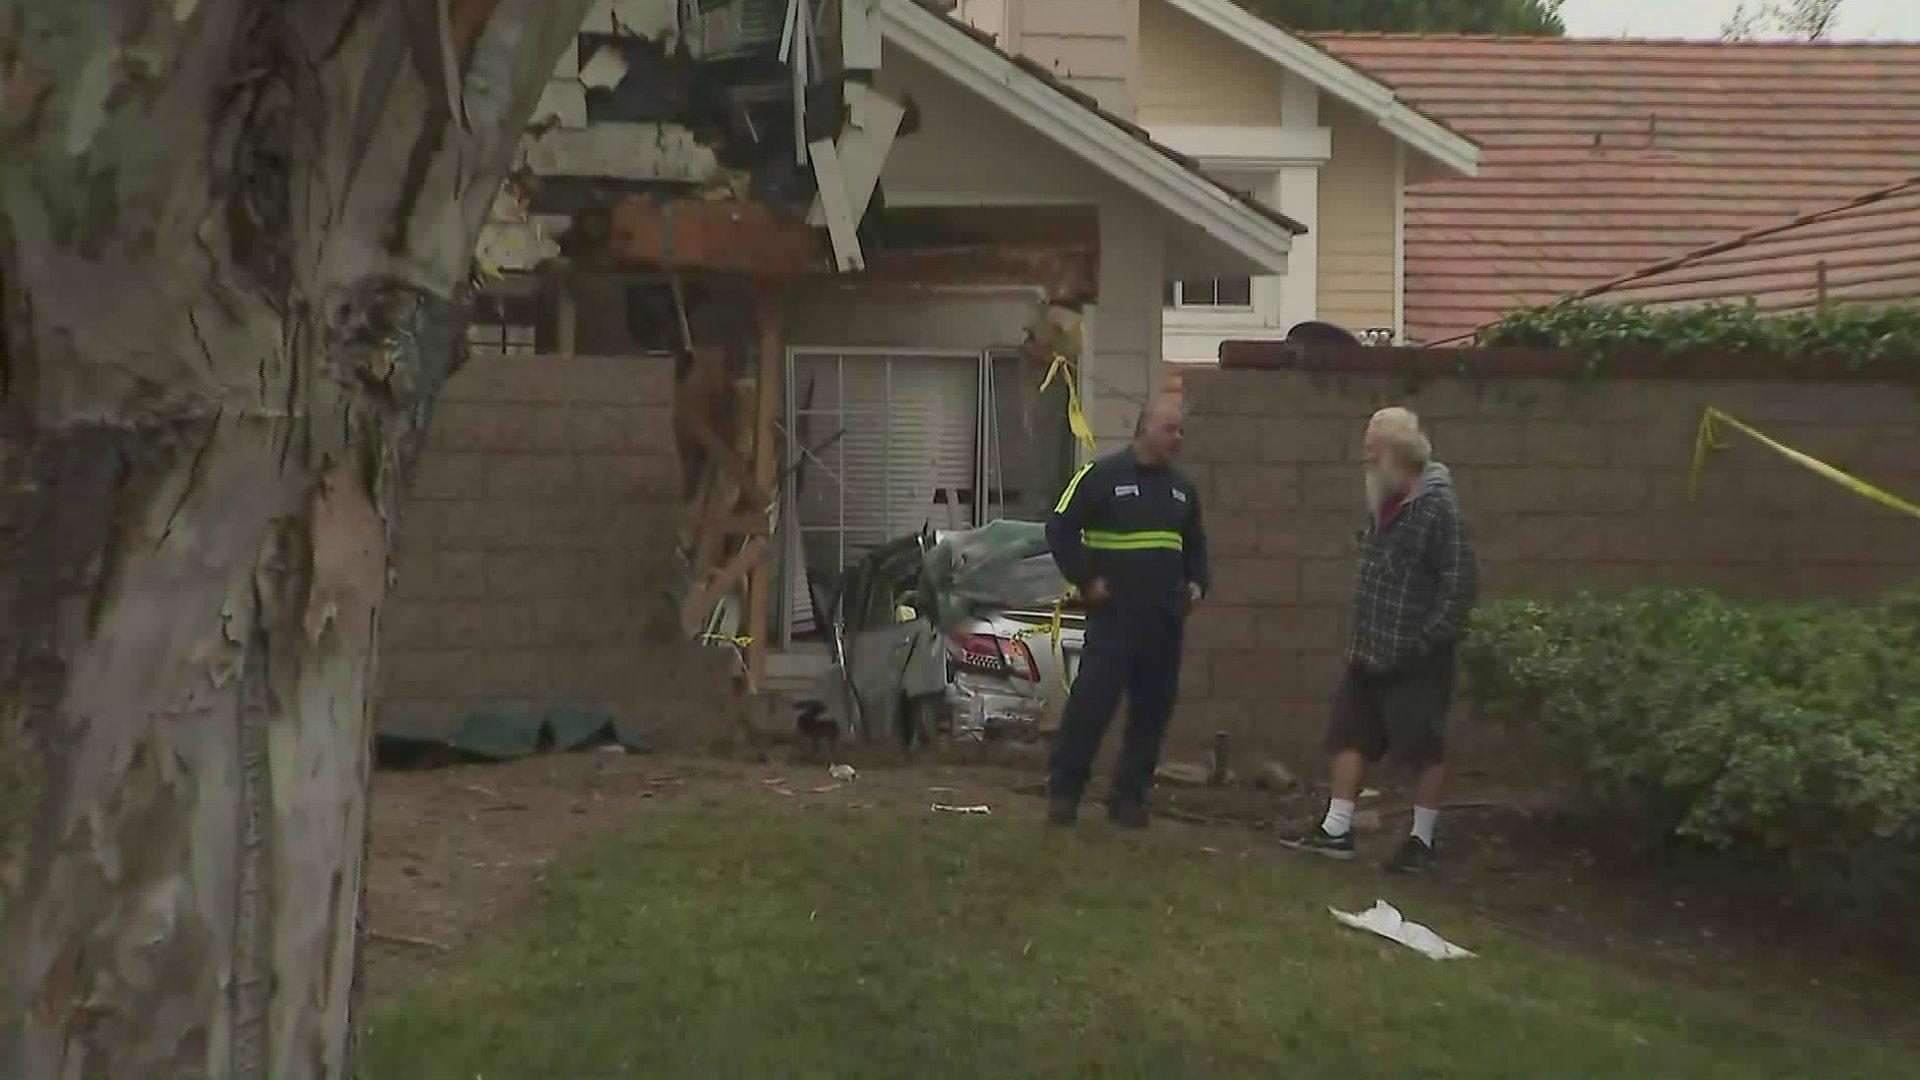 A car plowed into a Tustin home on Jan. 25, 2020. (Credit: KTLA)